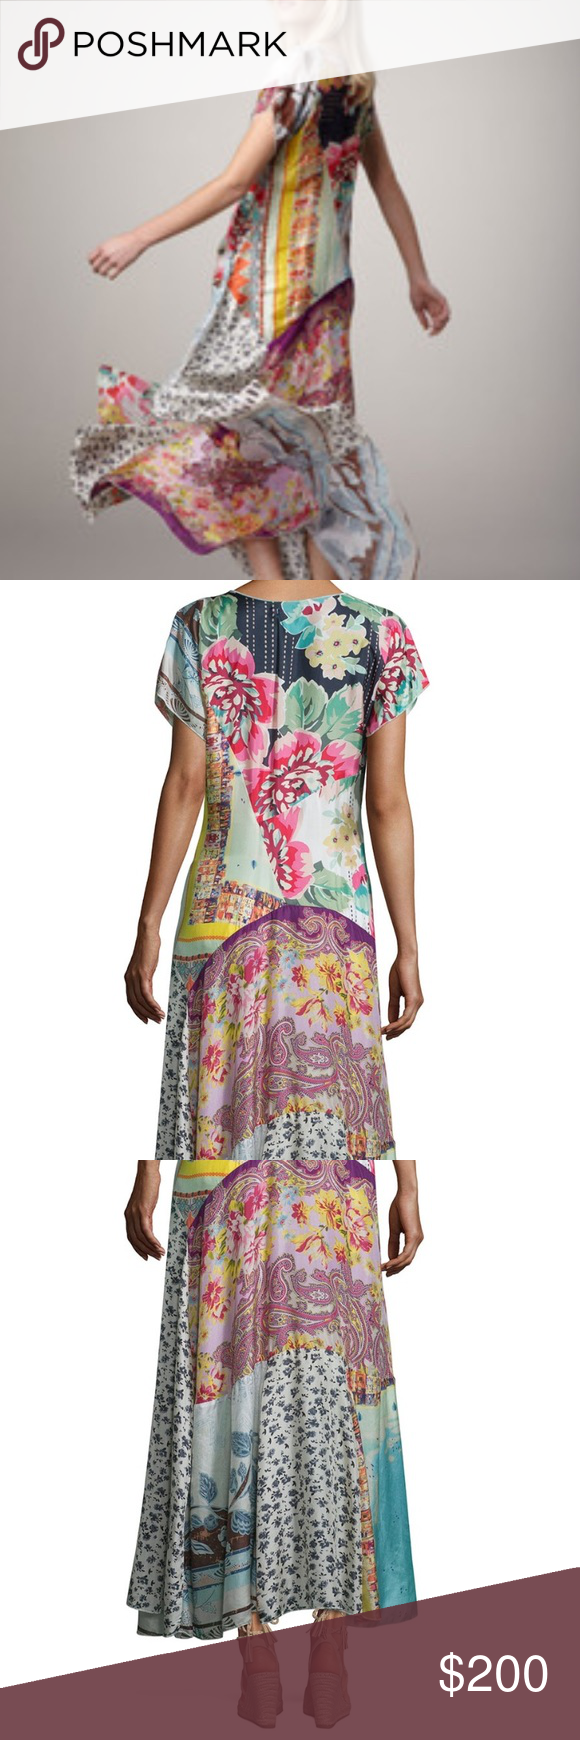 💙 SALE 💙 Johnny Was Georgette Maxi Dress | Dresses, Dress ...